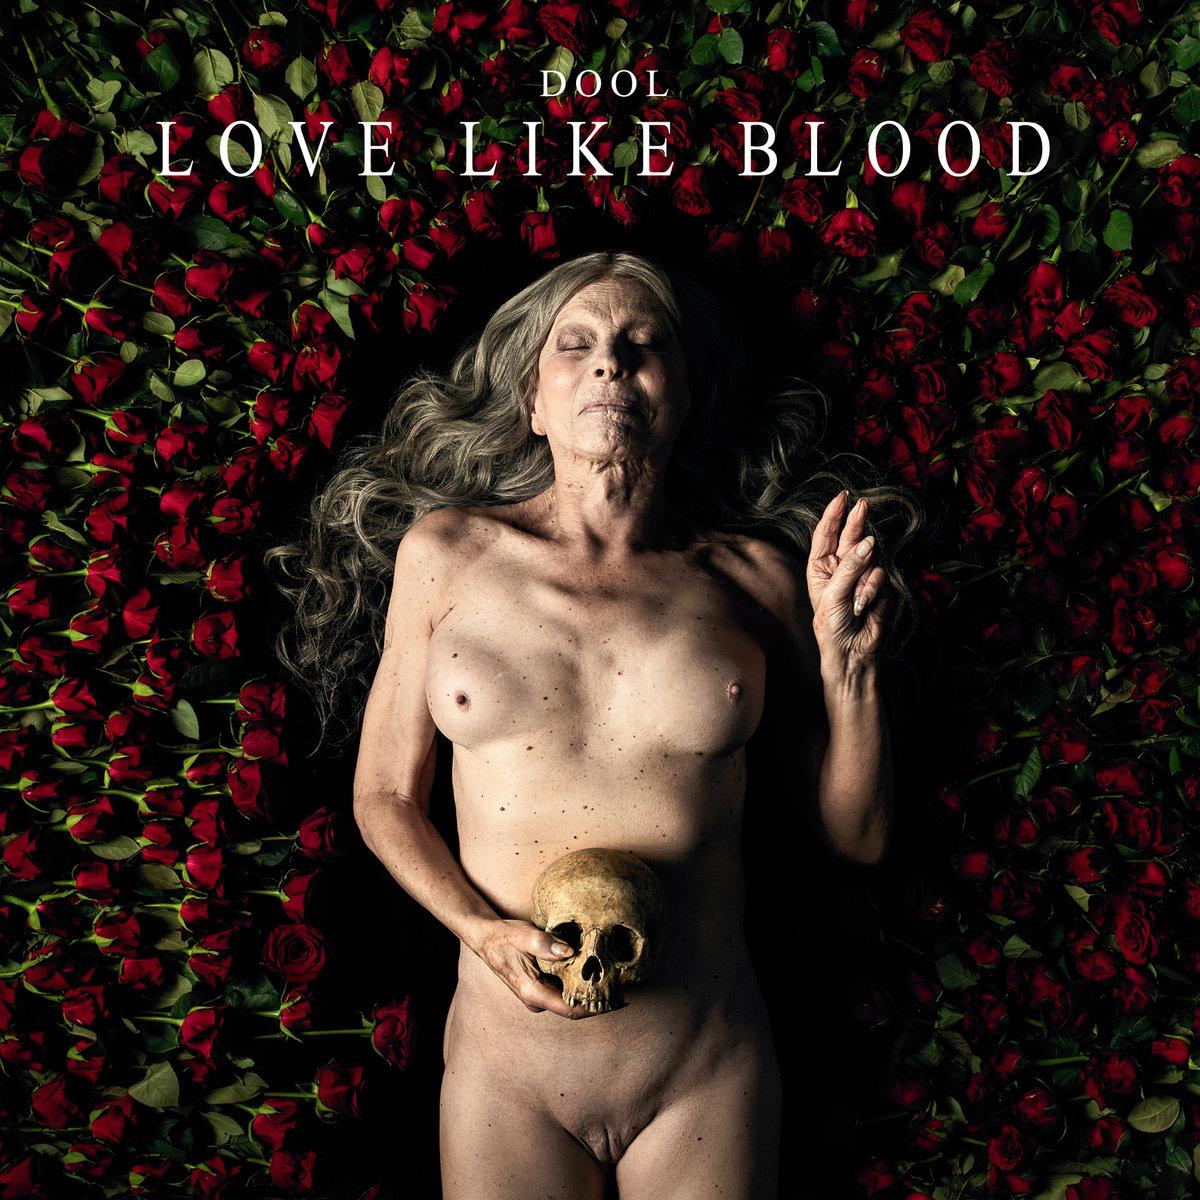 Dool - Love Like Blood [10